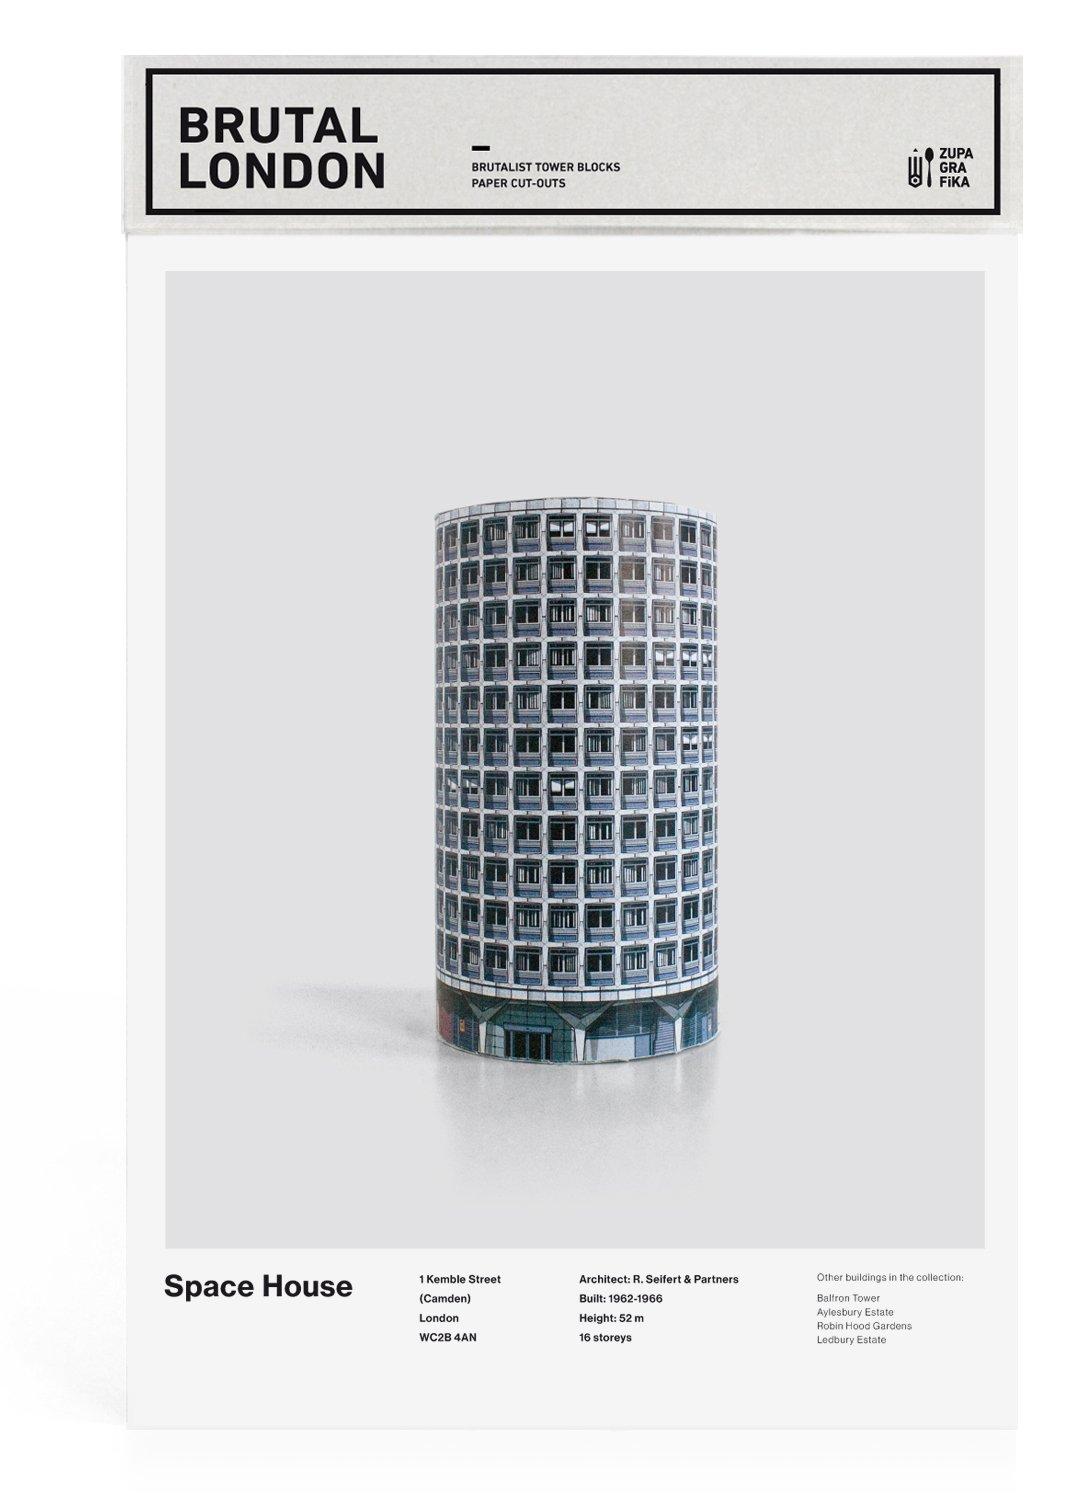 Brutal London: Space House: Build Your Own Brutalist London ebook